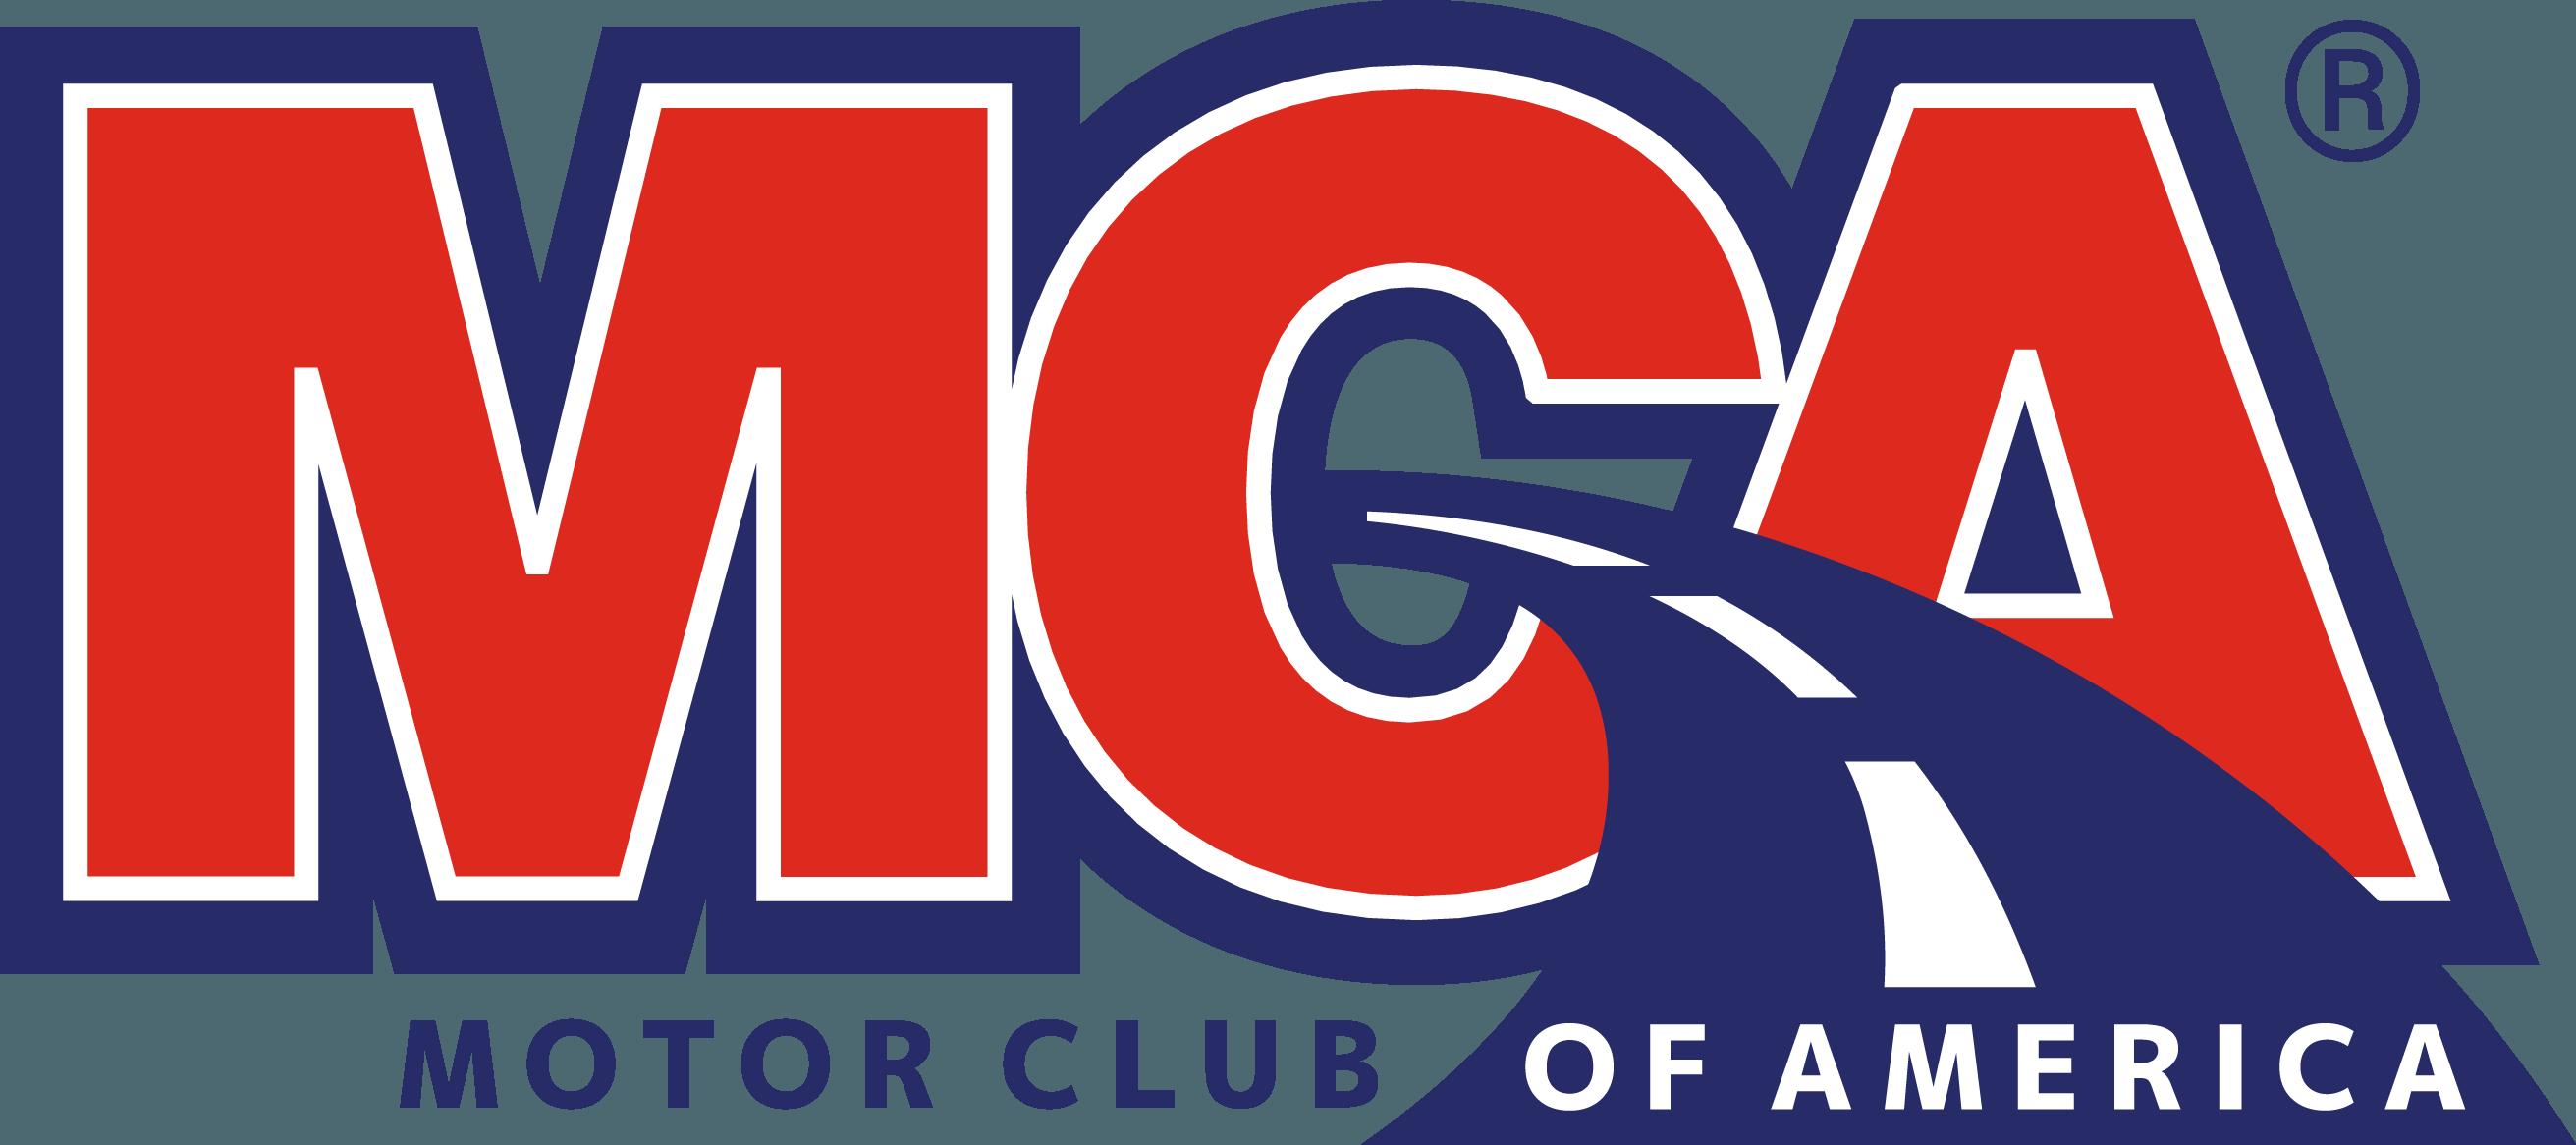 MCA Logo (Motor Club of America) png